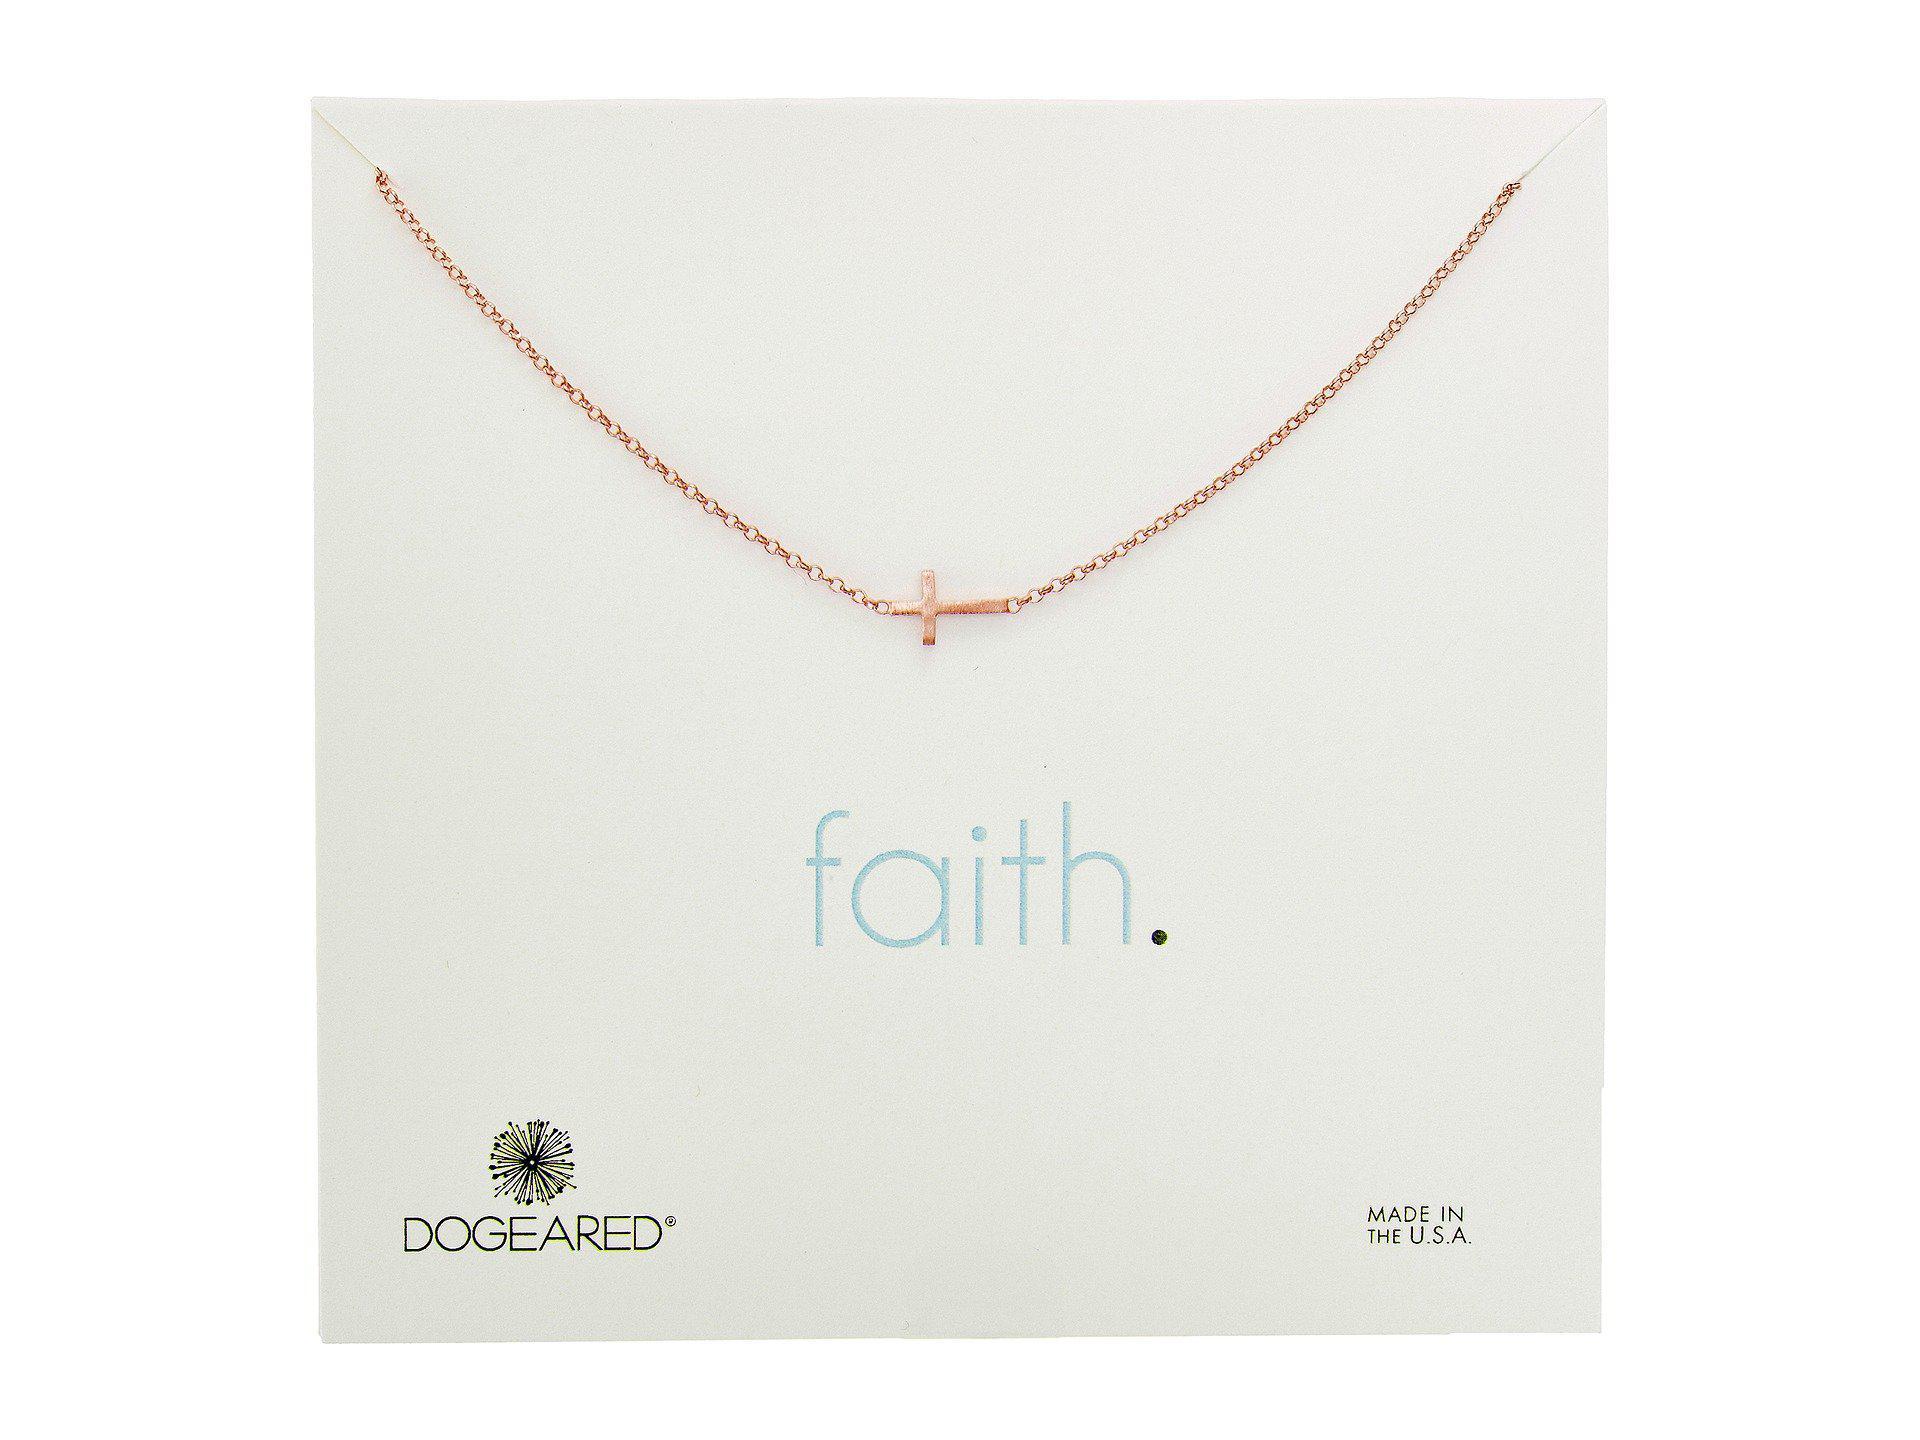 64f8f9b02da79 Lyst - Dogeared Faith, Small Sideways Cross Necklace in Metallic